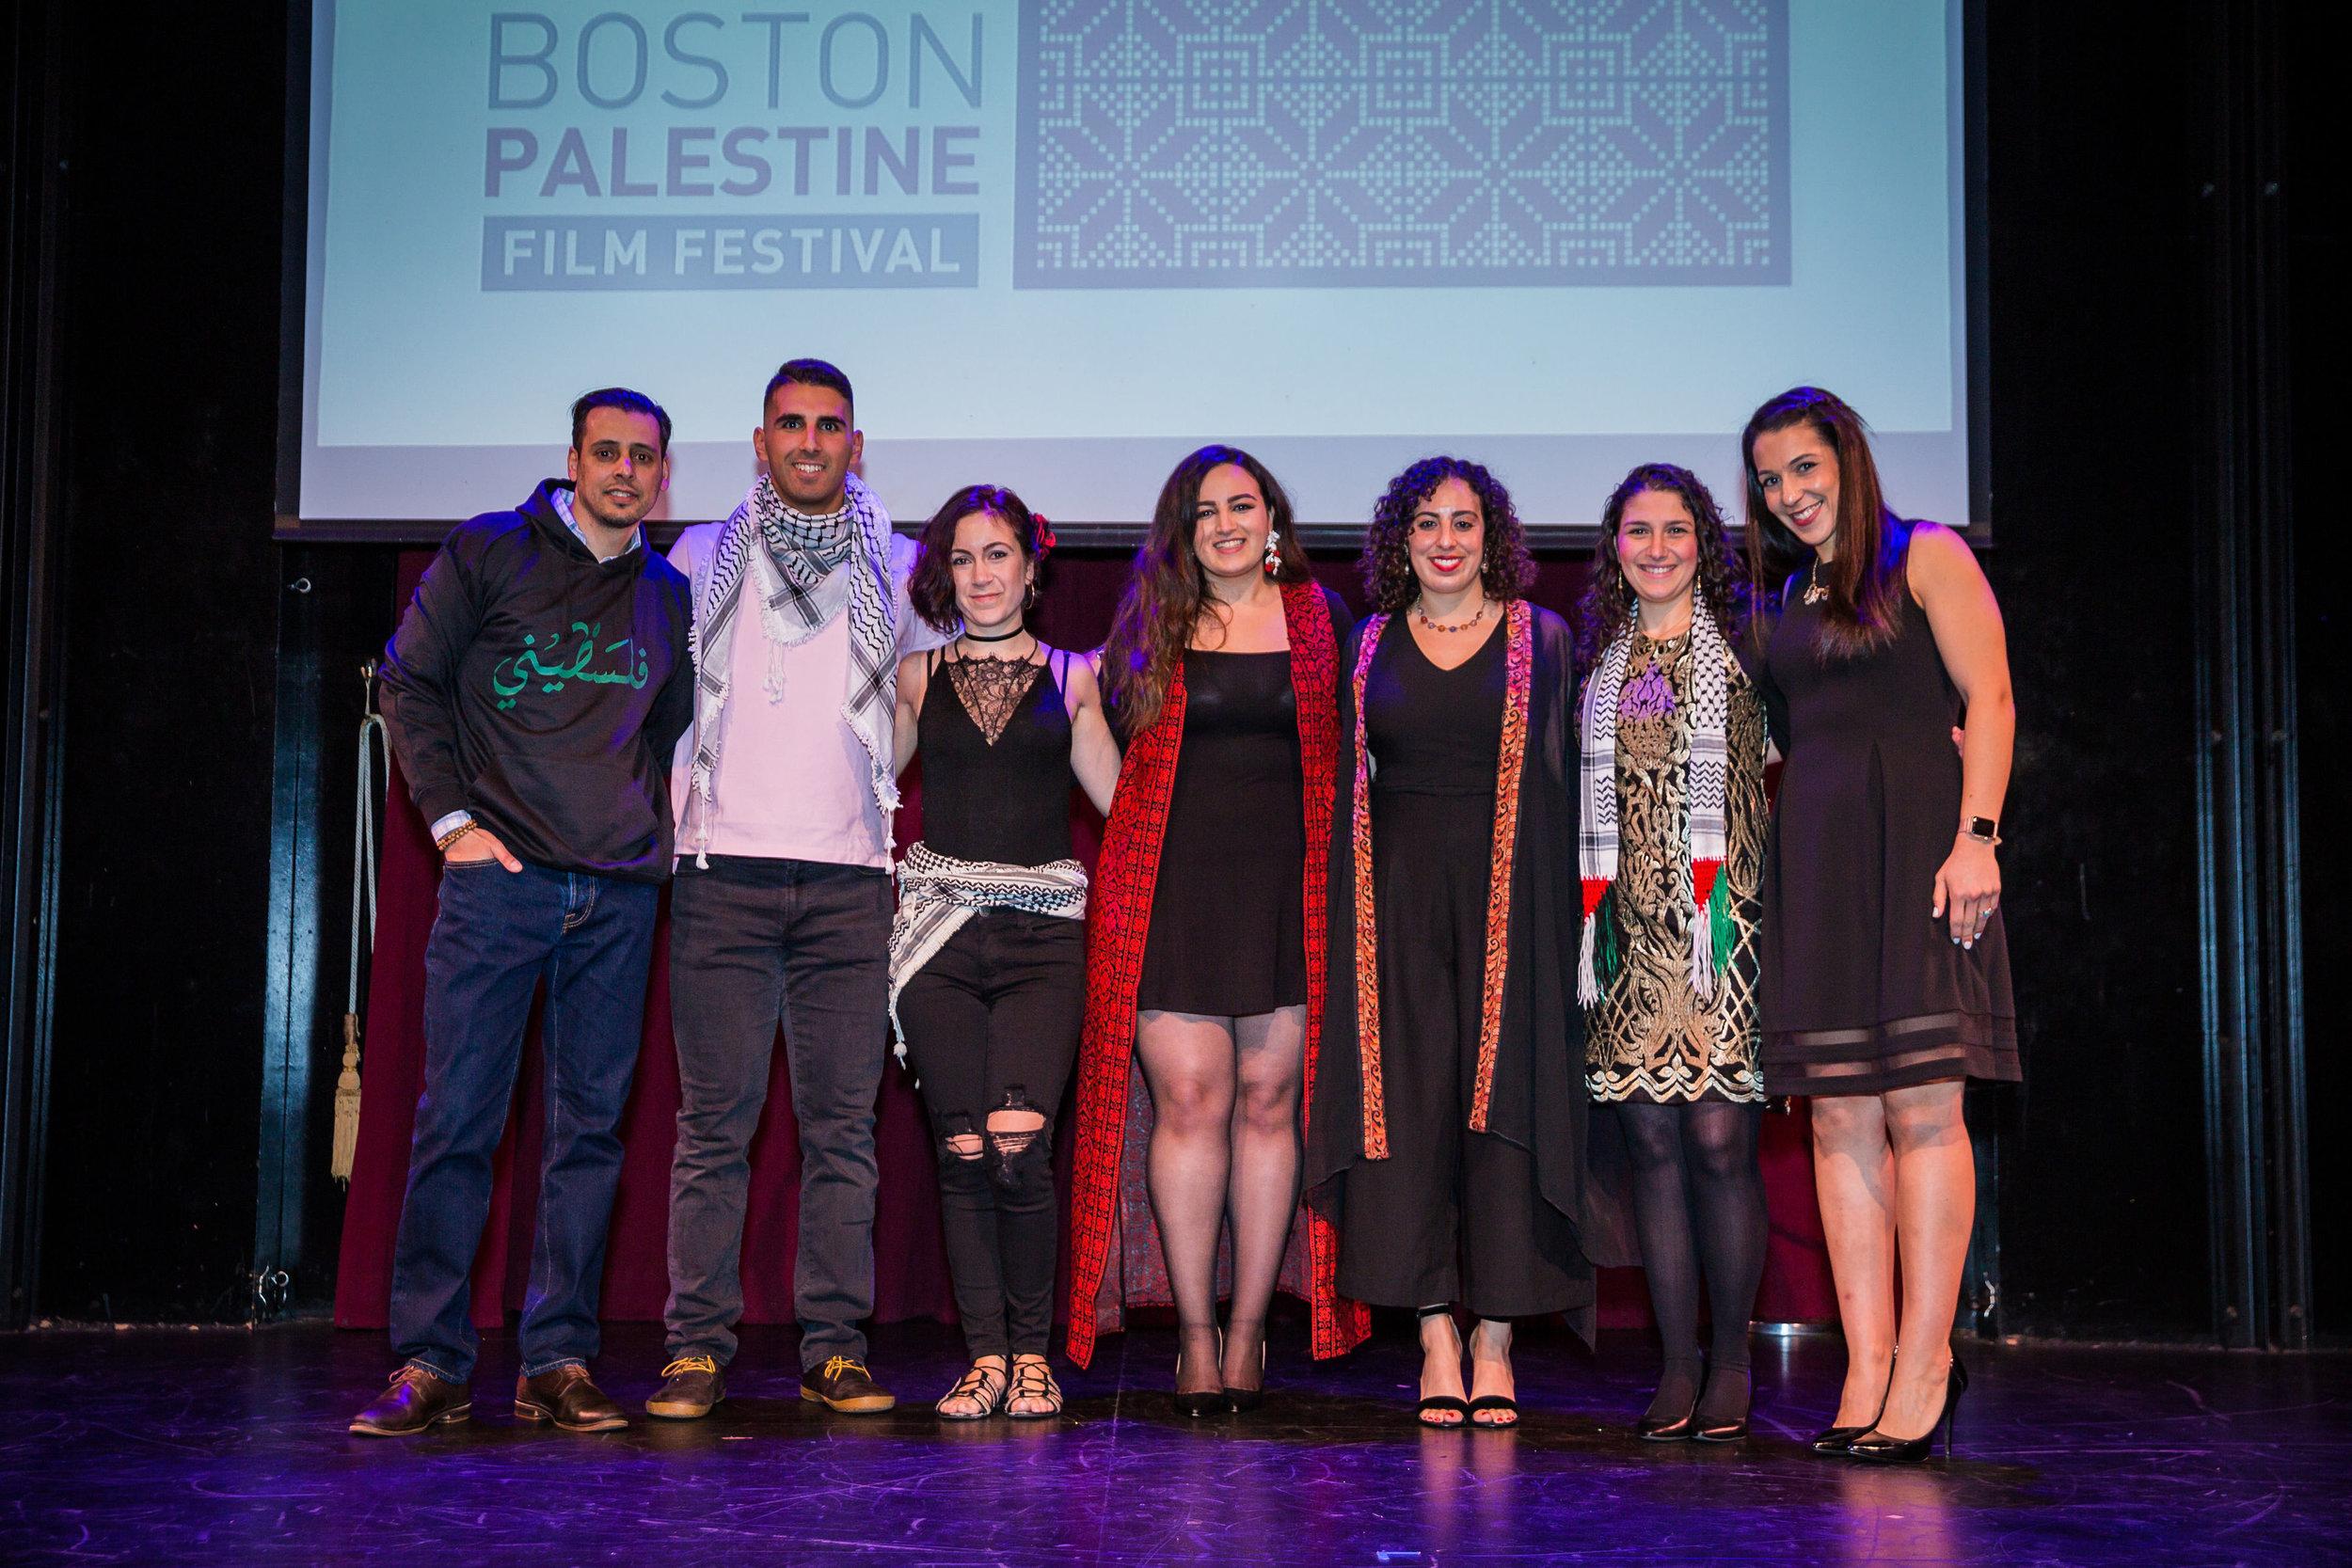 Palestinians, Live! BostonFebruary 17, 2019, Oberon TheaterIn collaboration with the Boston Palestine Film Festival. - Storytellers: Tarek AbuJabarah, Christian Tabash, Raisa Abdeen, Laura Sabrina Al Bast, Randa Wahbe, Linda Hamdan and Nadia Abuelezam.